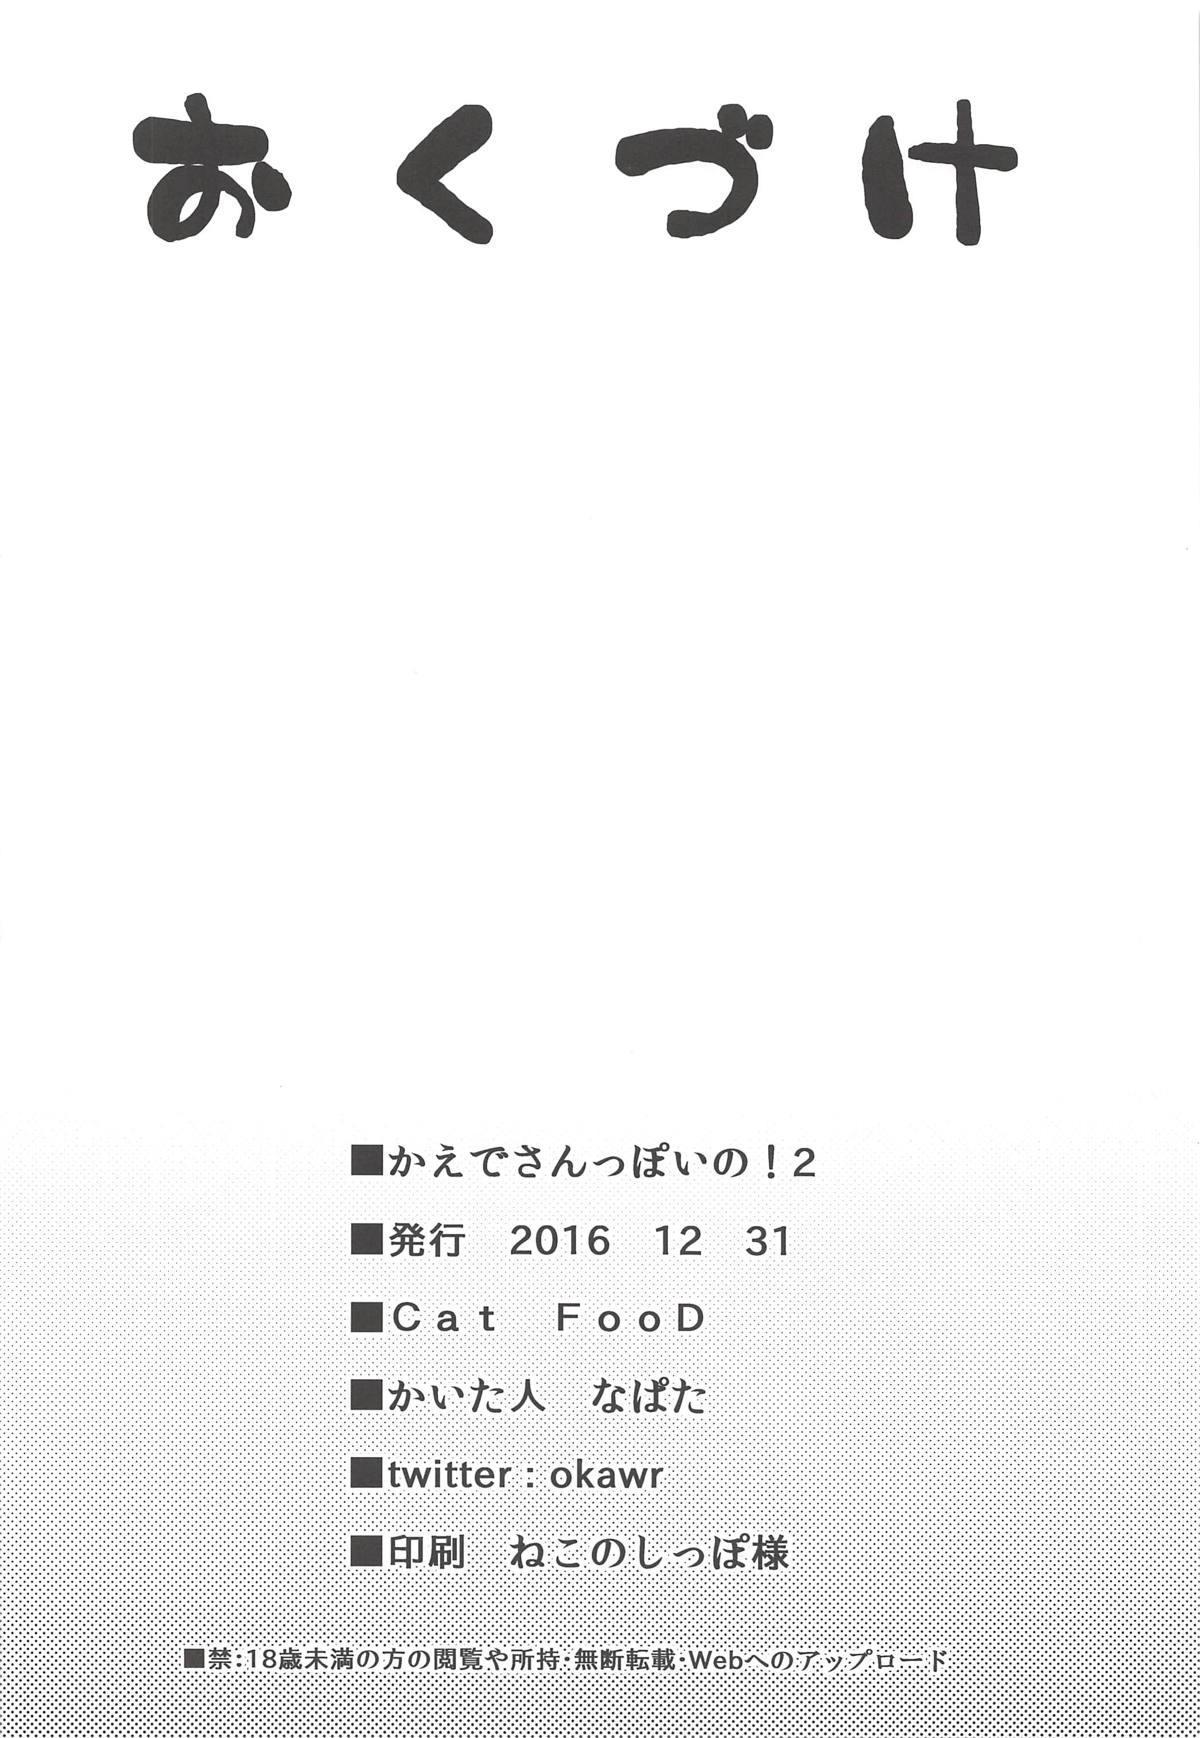 (C91) [Cat FooD (Napata)] Kaede-san-ppoi no! 2 (THE IDOLM@STER CINDERELLA GIRLS) 16